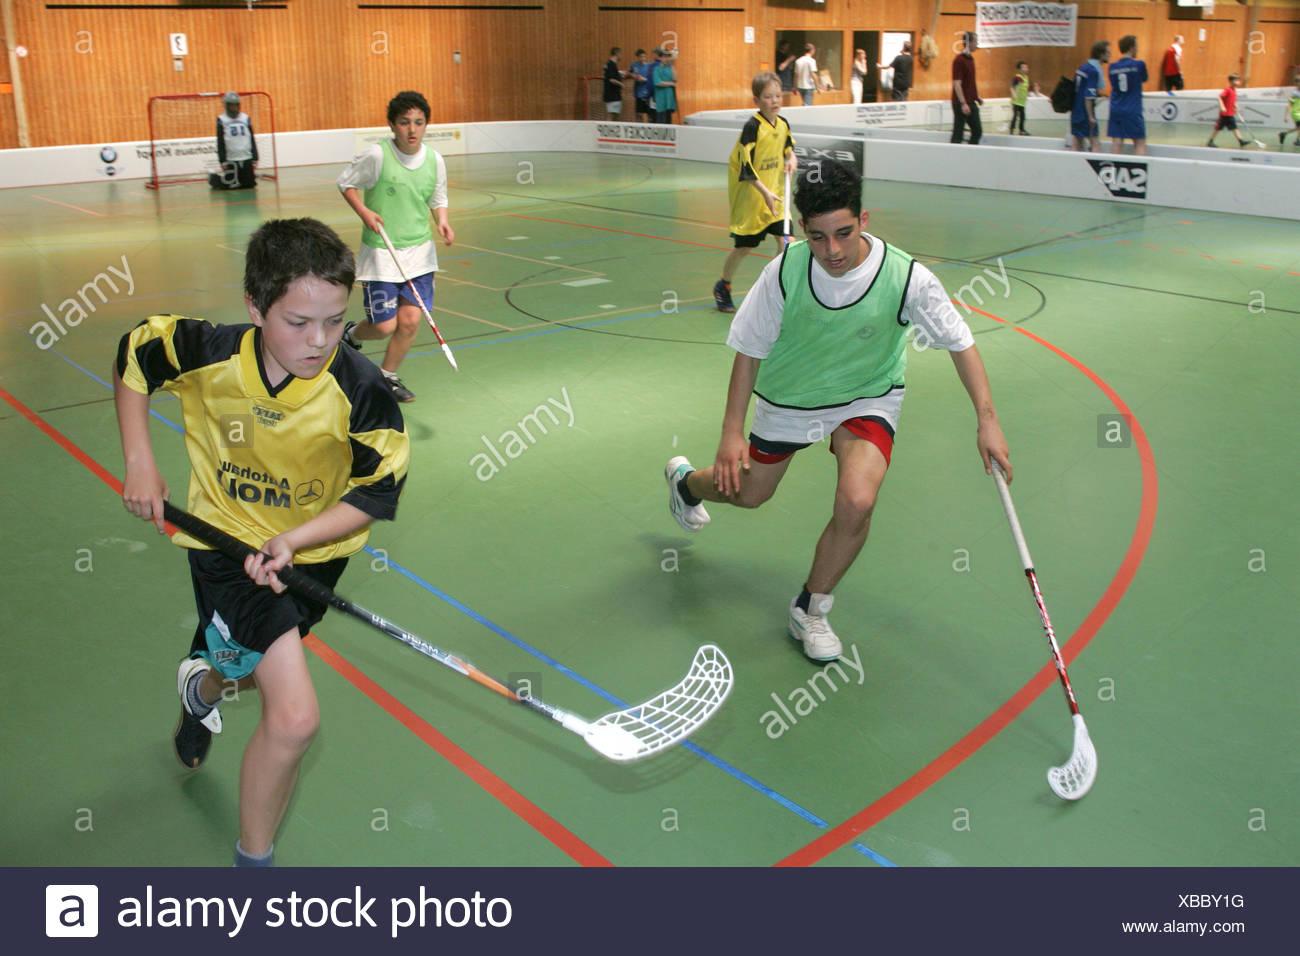 Heidelberg, DEU, 30.04.2005, Unihockey tournament - Stock Image